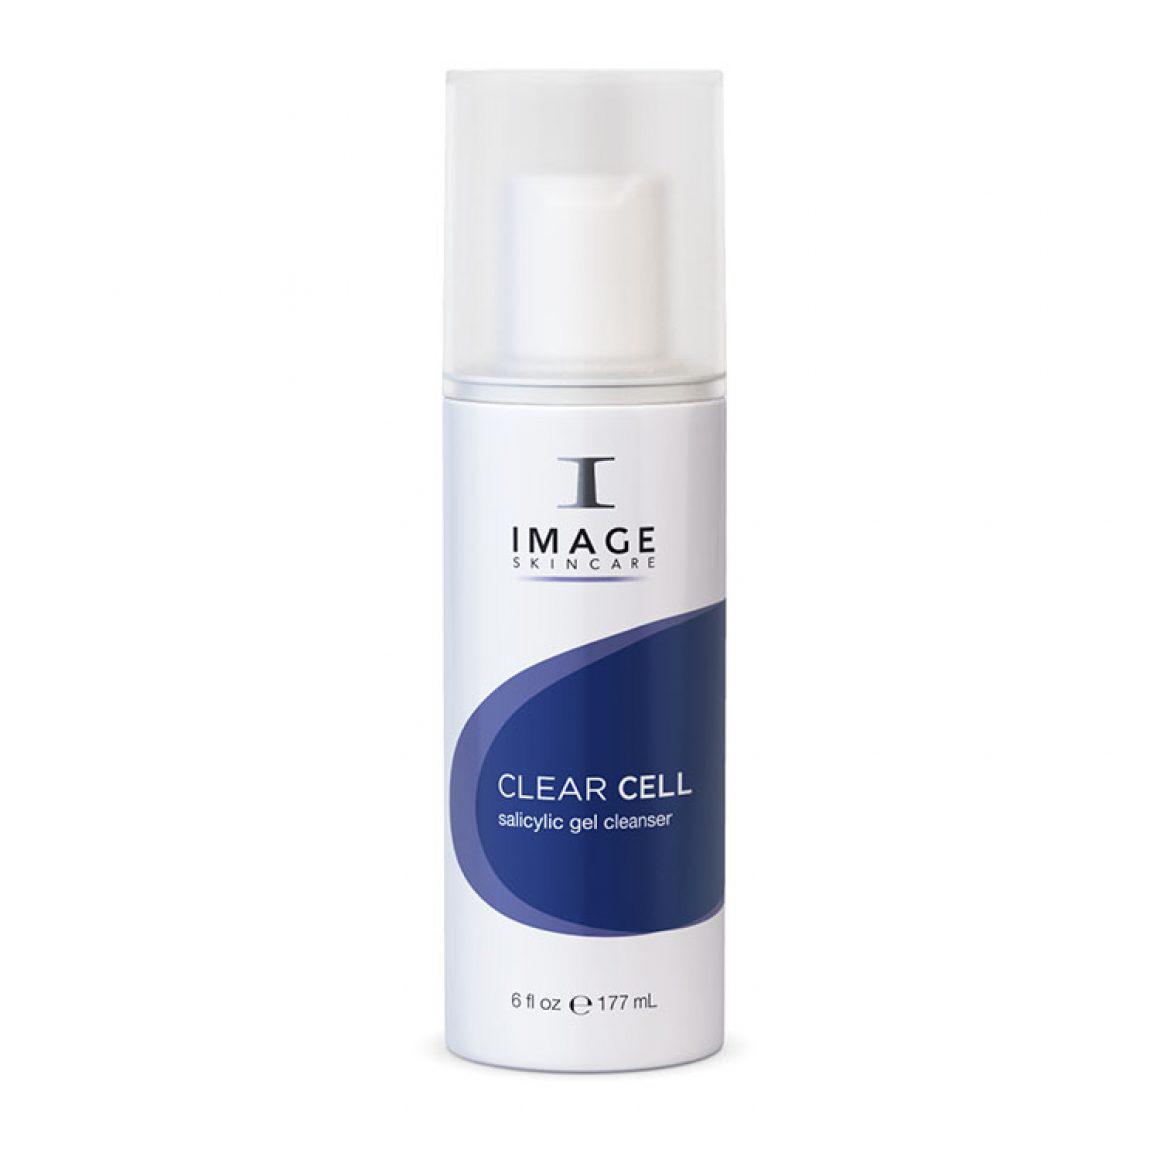 IMAGE Skincare Очищающий салициловый гель Clear Cell,177 мл